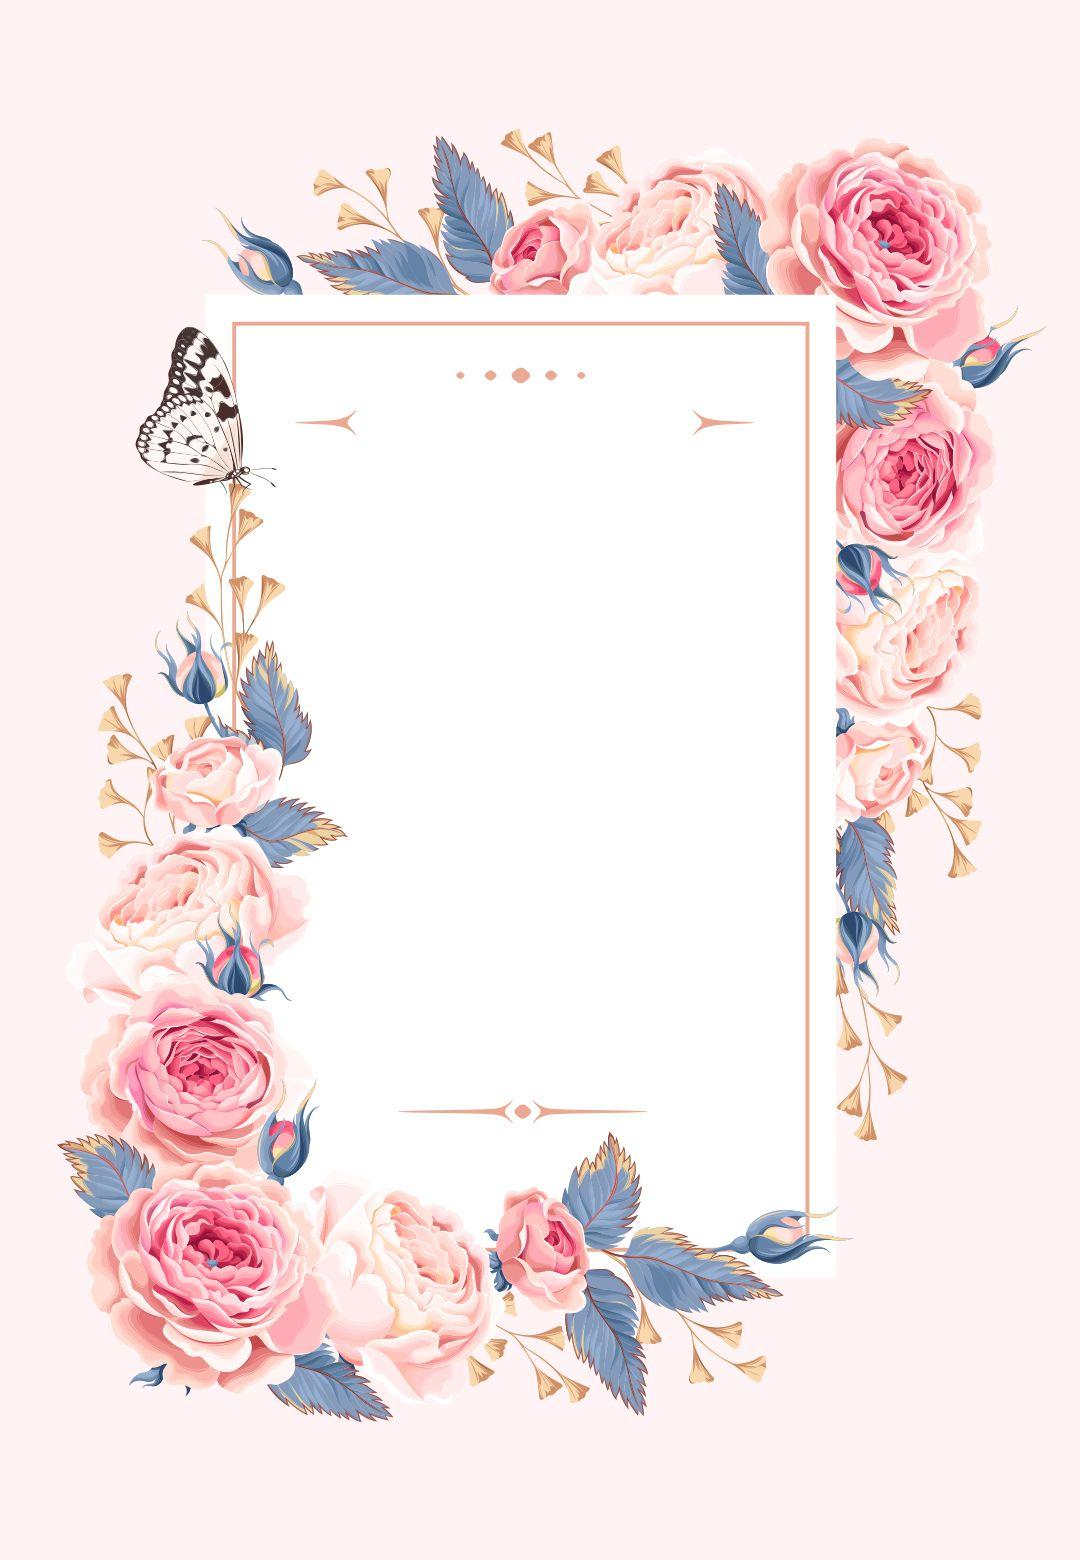 Climbing Roses Wedding Invitation Template (free) Greetings Island Convite aniversario